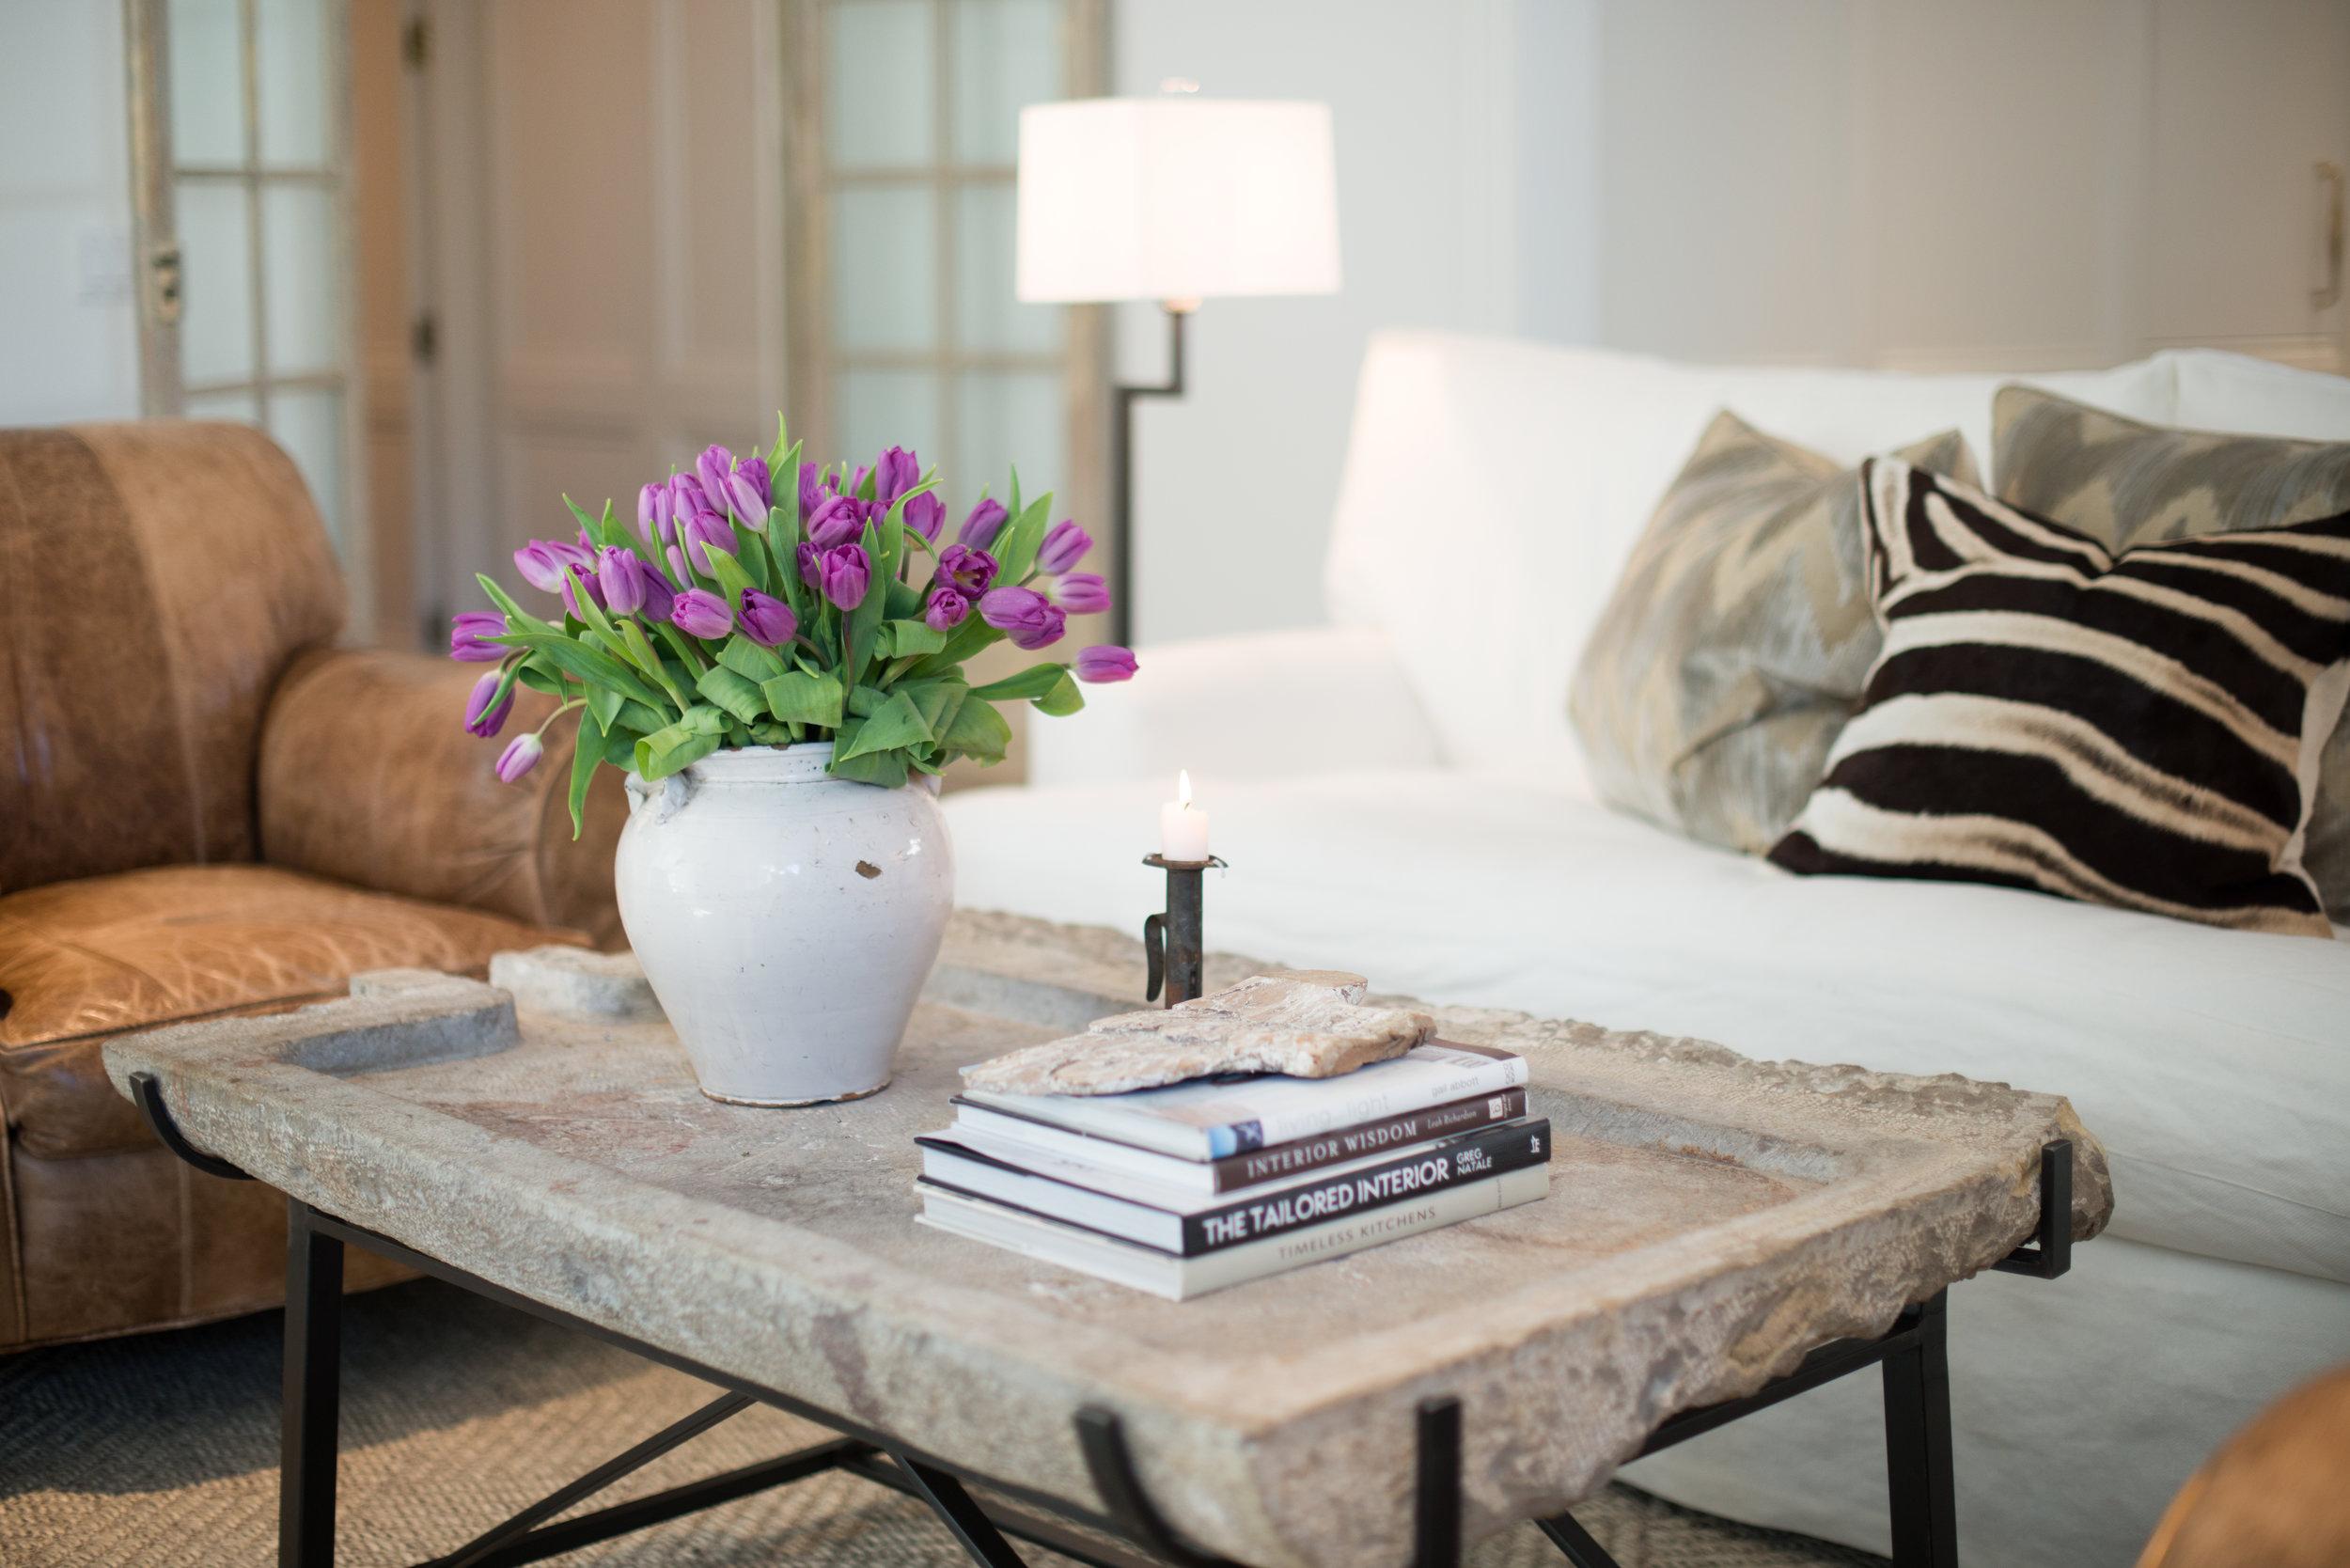 Zero Lot Line Remodel | Private Residence |Dallas, Texas - +View Project